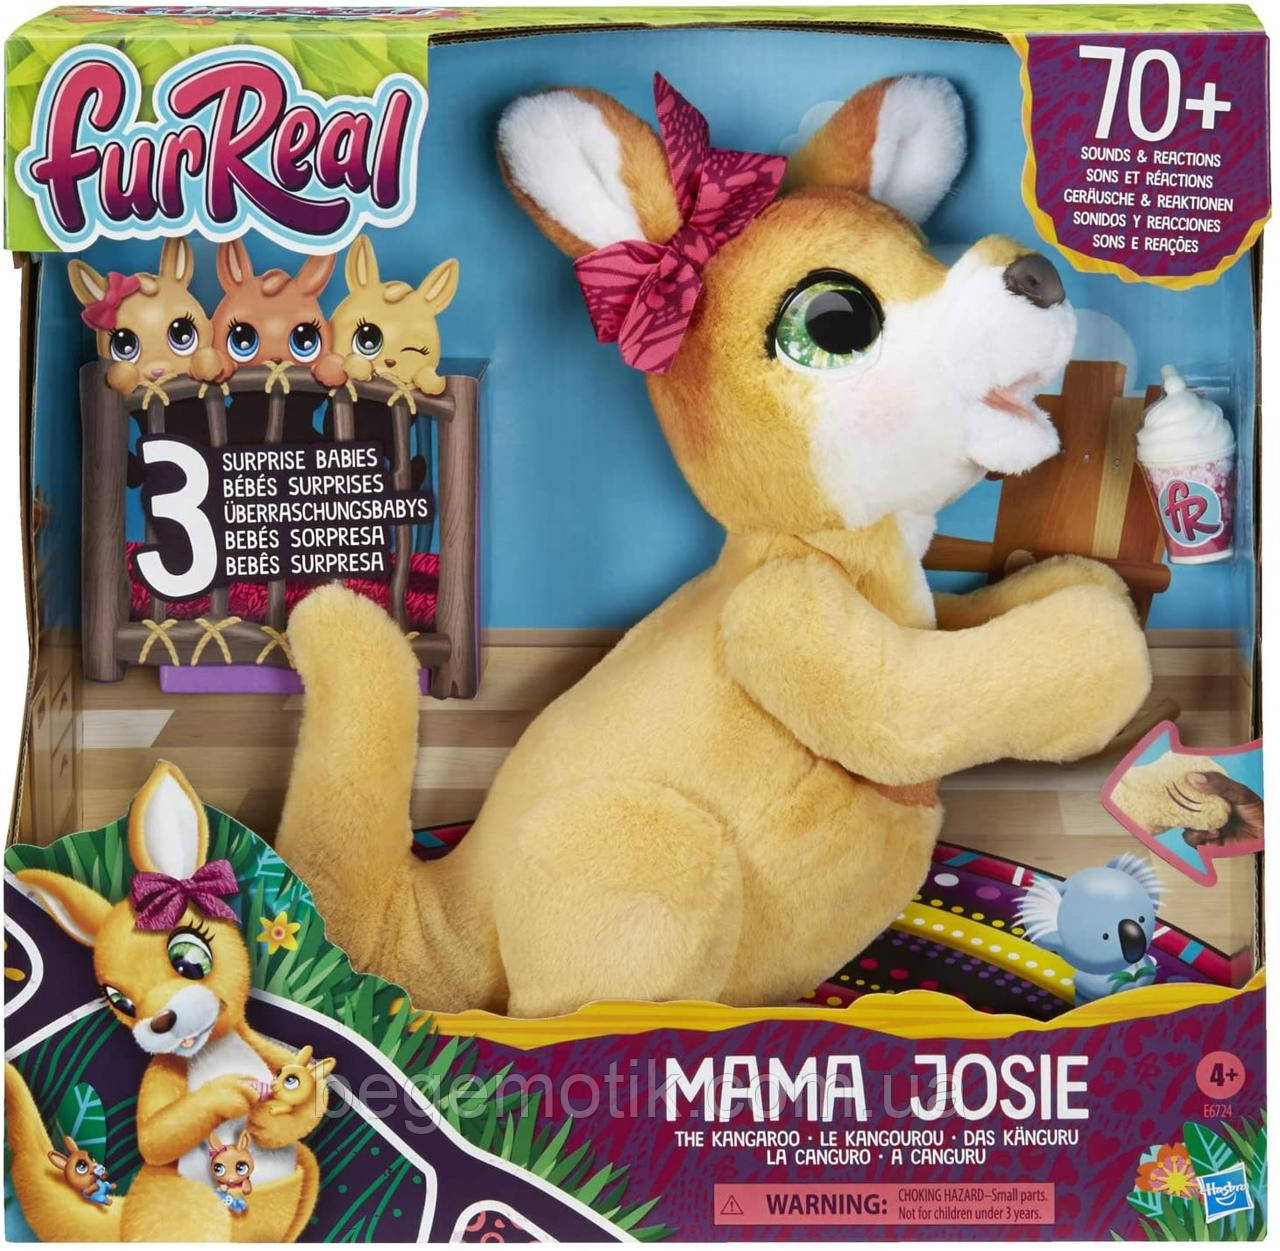 Furreal Friends Интерактивная игрушка Кенгуру Мама Джози с малышами, FurReal Mama Josie The Kangaroo